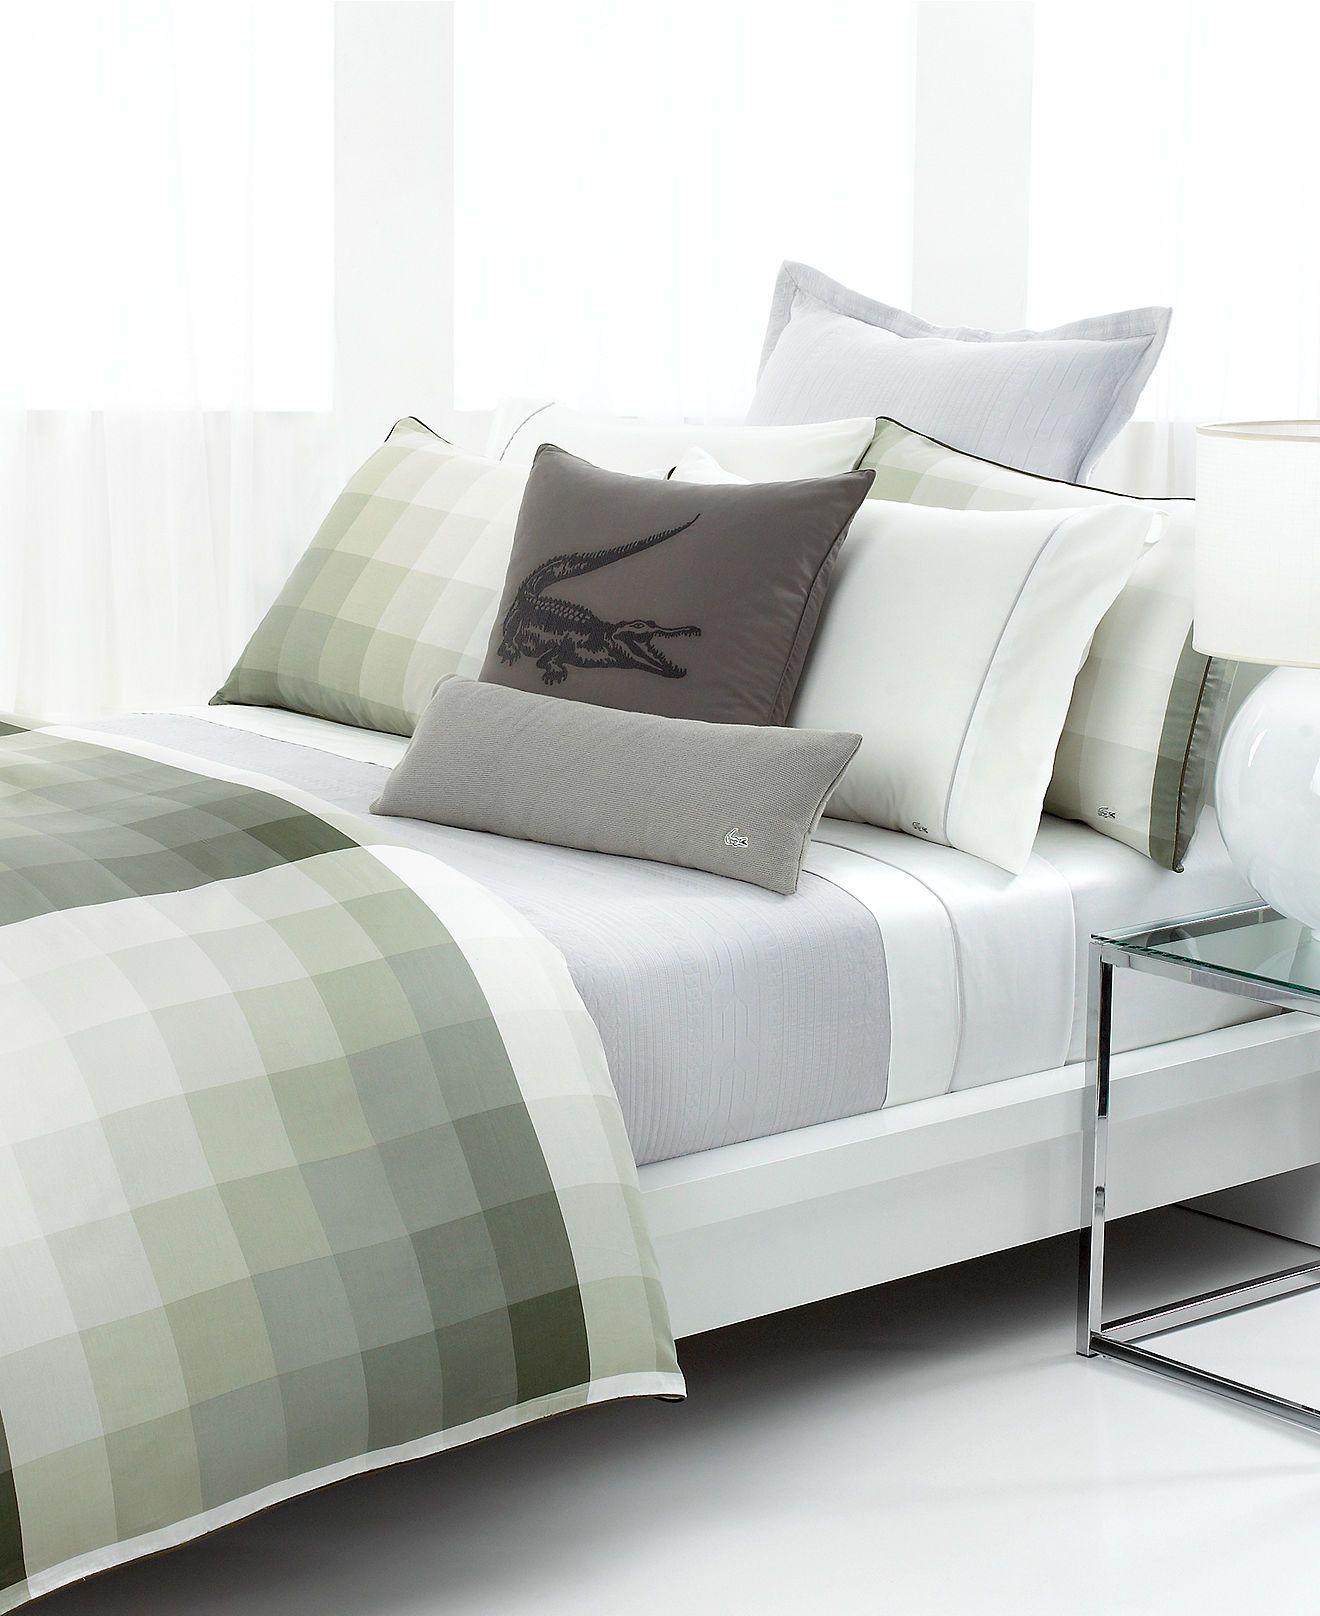 lacoste lentua bedtextile | for the bedroom | pinterest | best